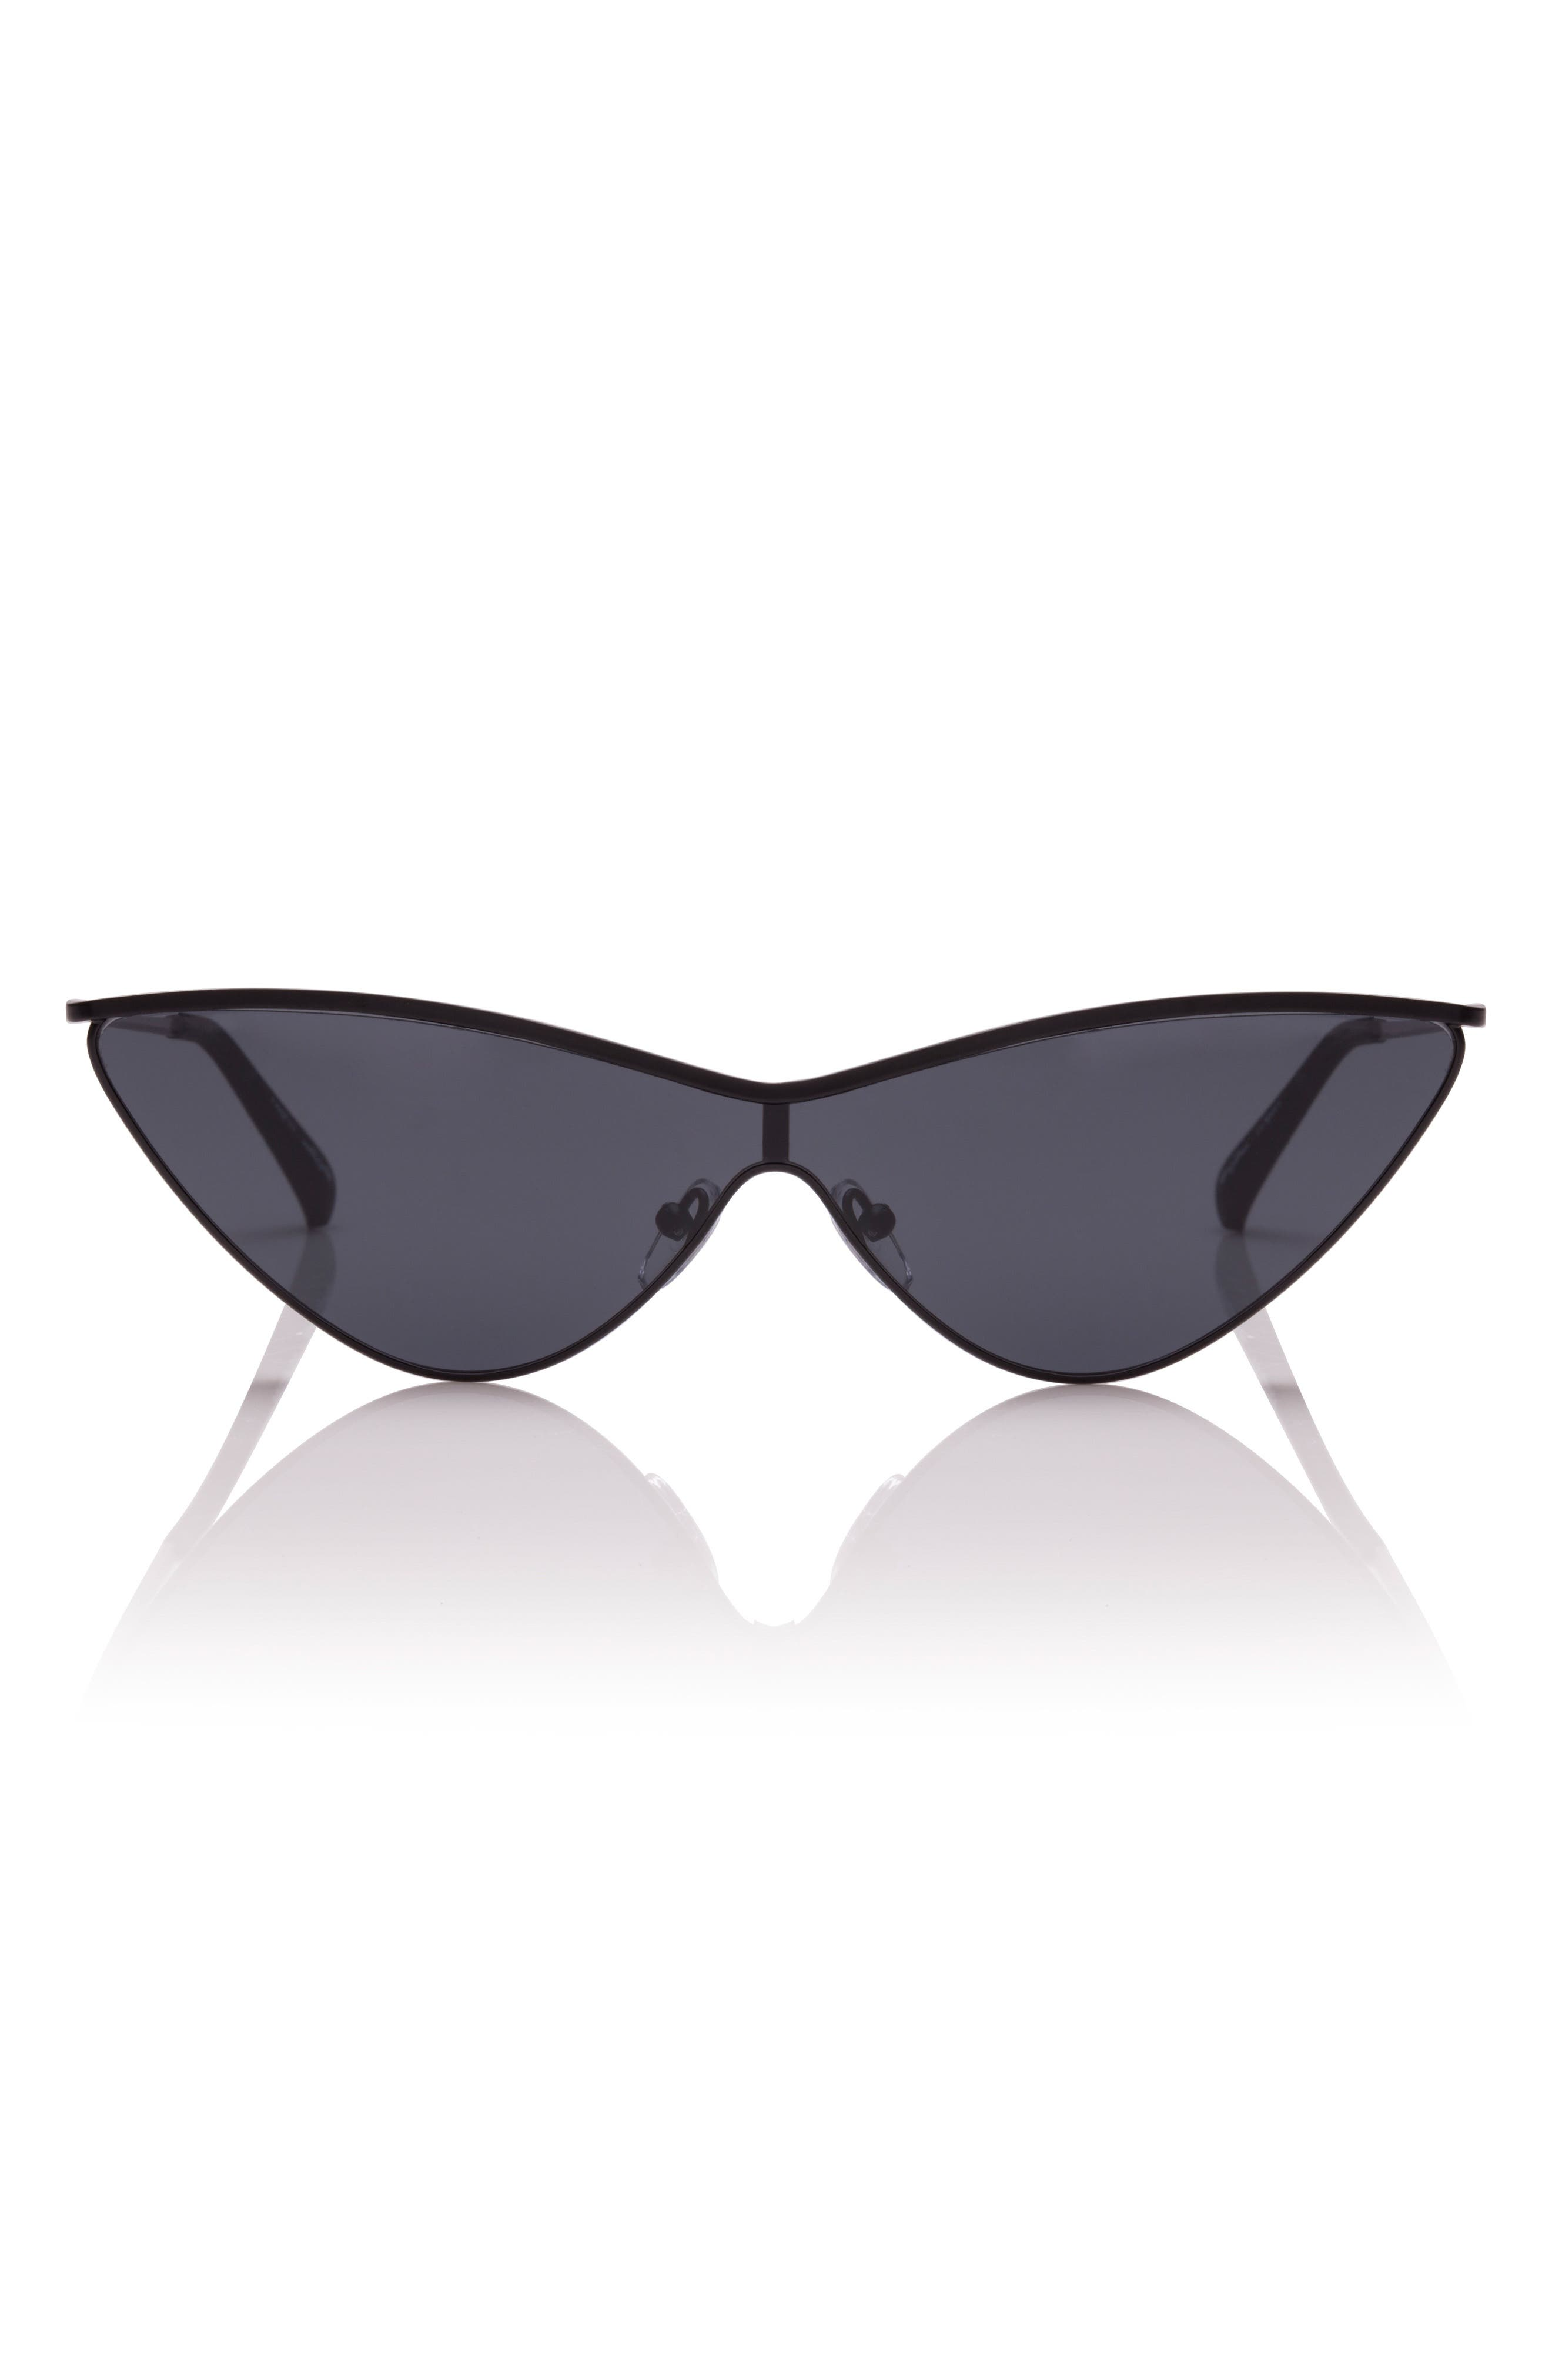 The Fugitive 71mm Sunglasses,                             Main thumbnail 1, color,                             Black/ Red